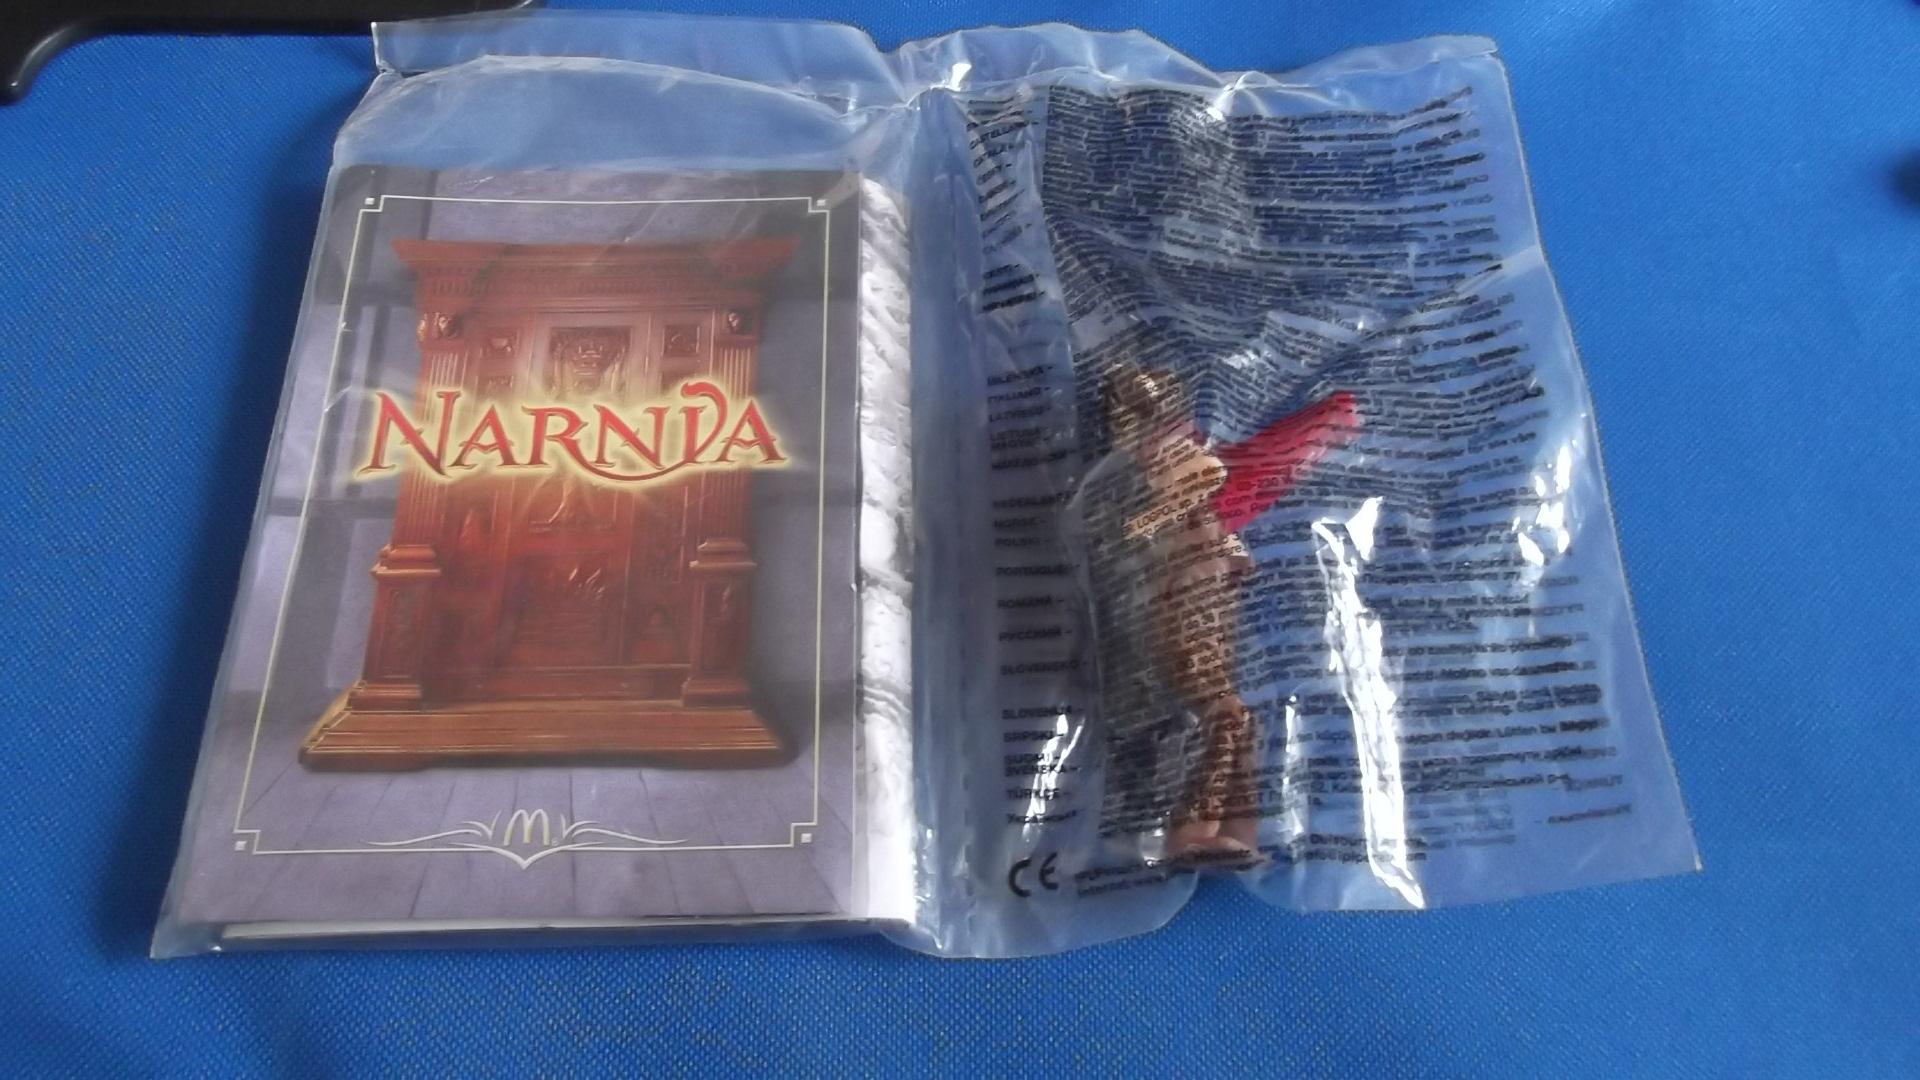 McDonalds Narnia Mr Tumnus Toy From 2005 New